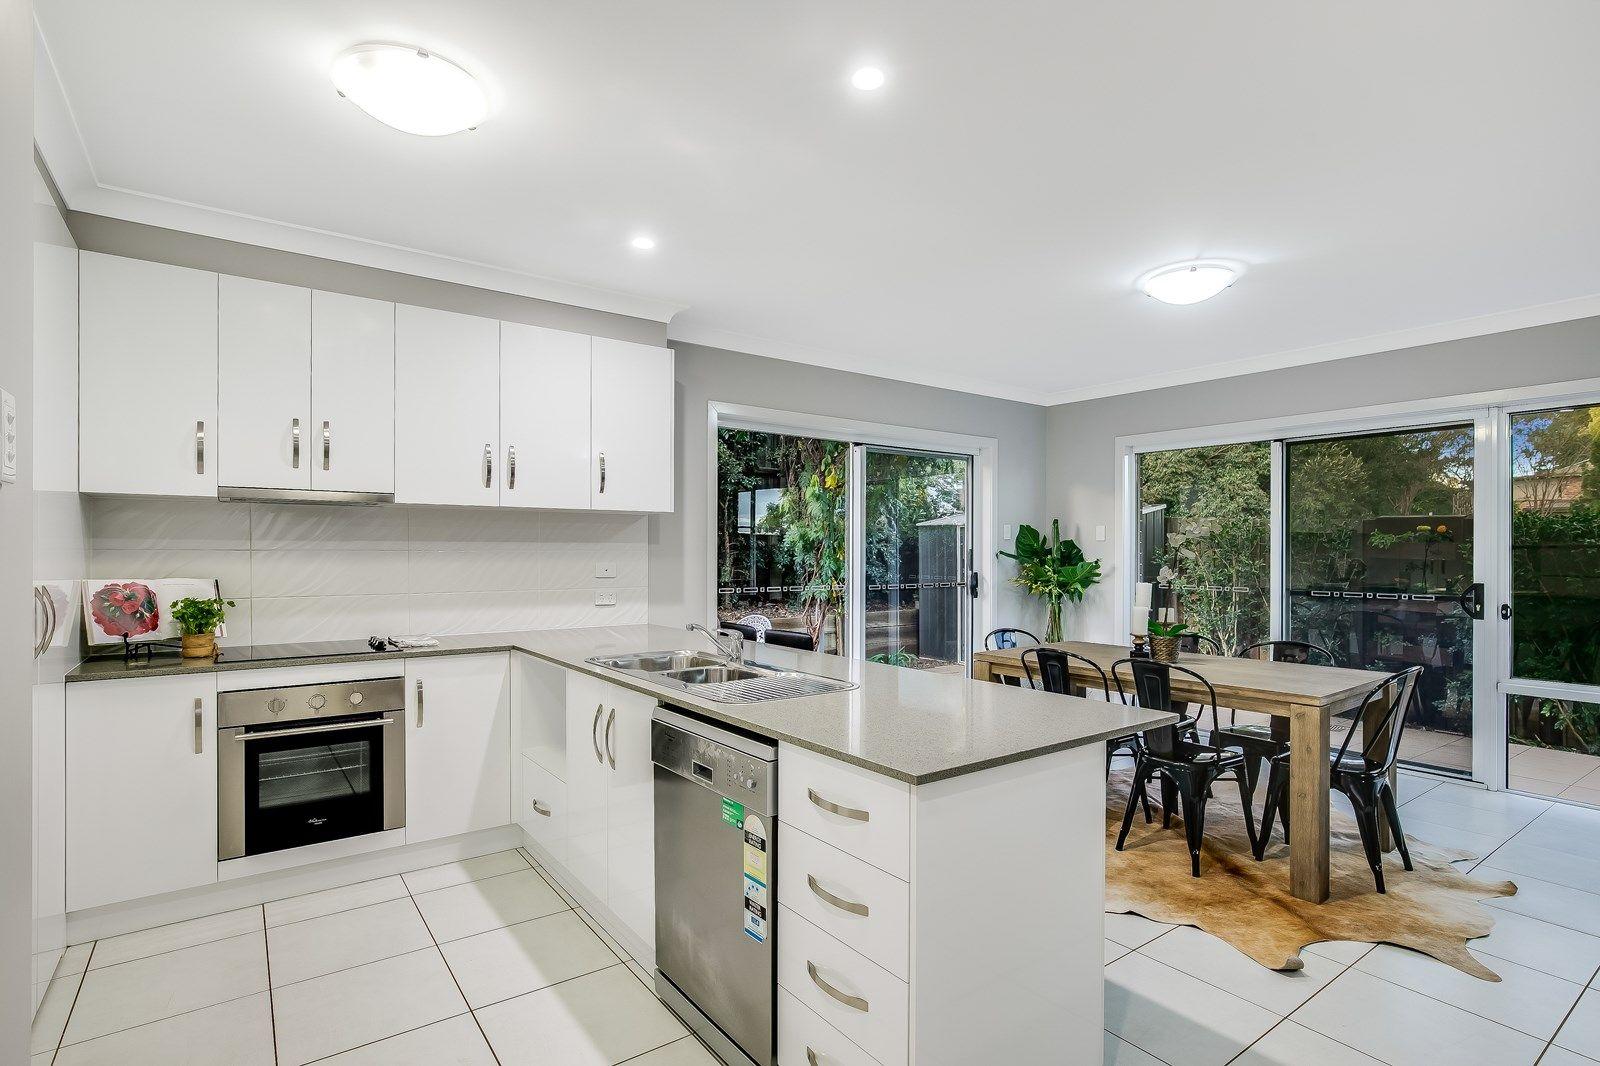 2/5 Messines Street, Harlaxton QLD 4350, Image 1